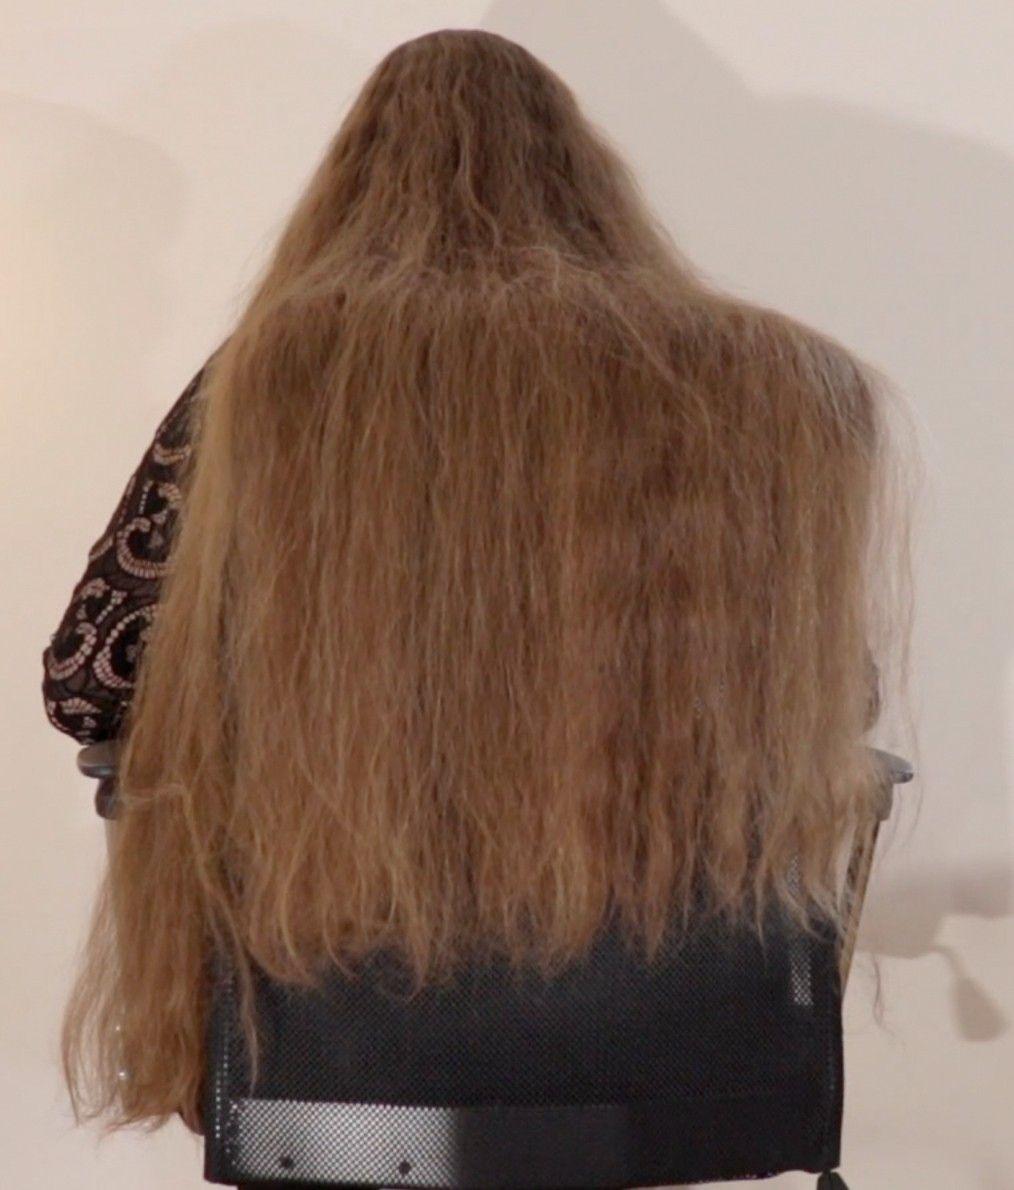 Video Office Rapunzel 3 Realrapunzels In 2021 Long Hair Styles Long Hair Play Beautiful Long Hair